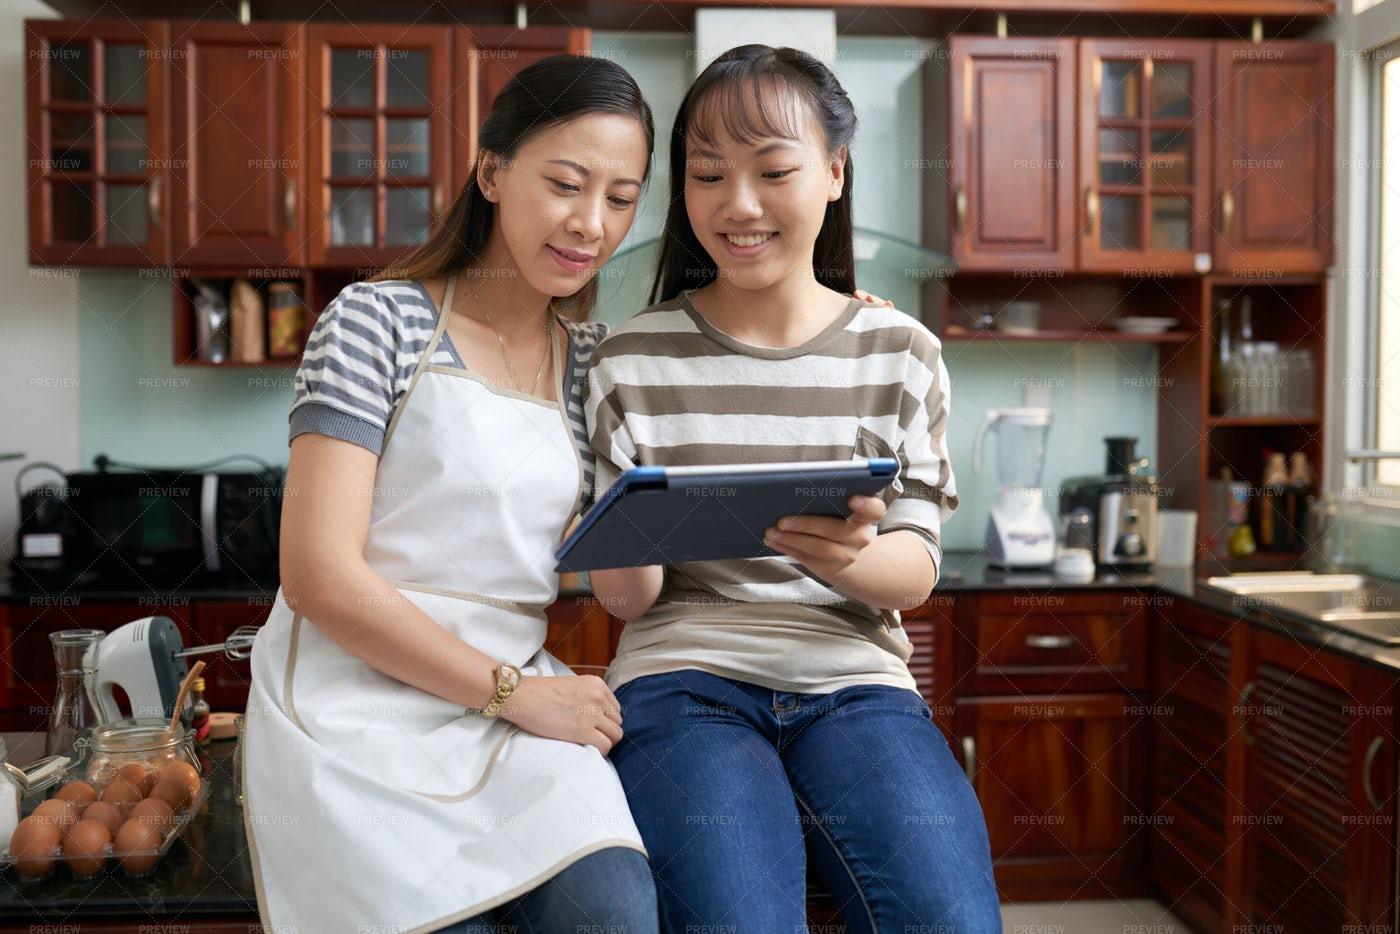 Mother And Daughter Reading Recip: Stock Photos